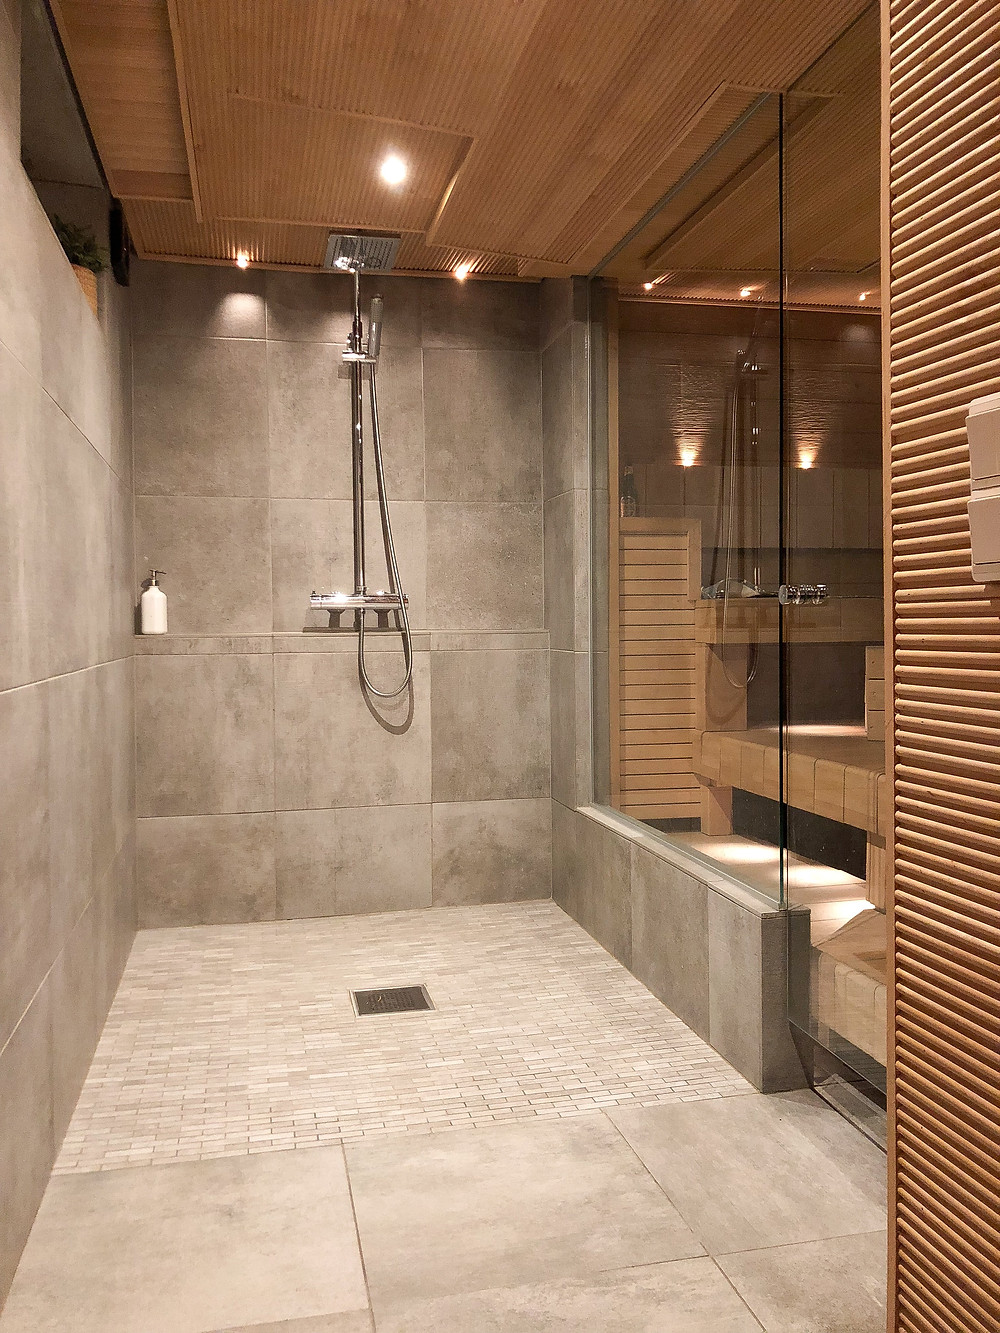 katto sormipaneelia, Factory Wall Grey laatta, lasiseinä saunaan, glass door to sauna, finger panel roof